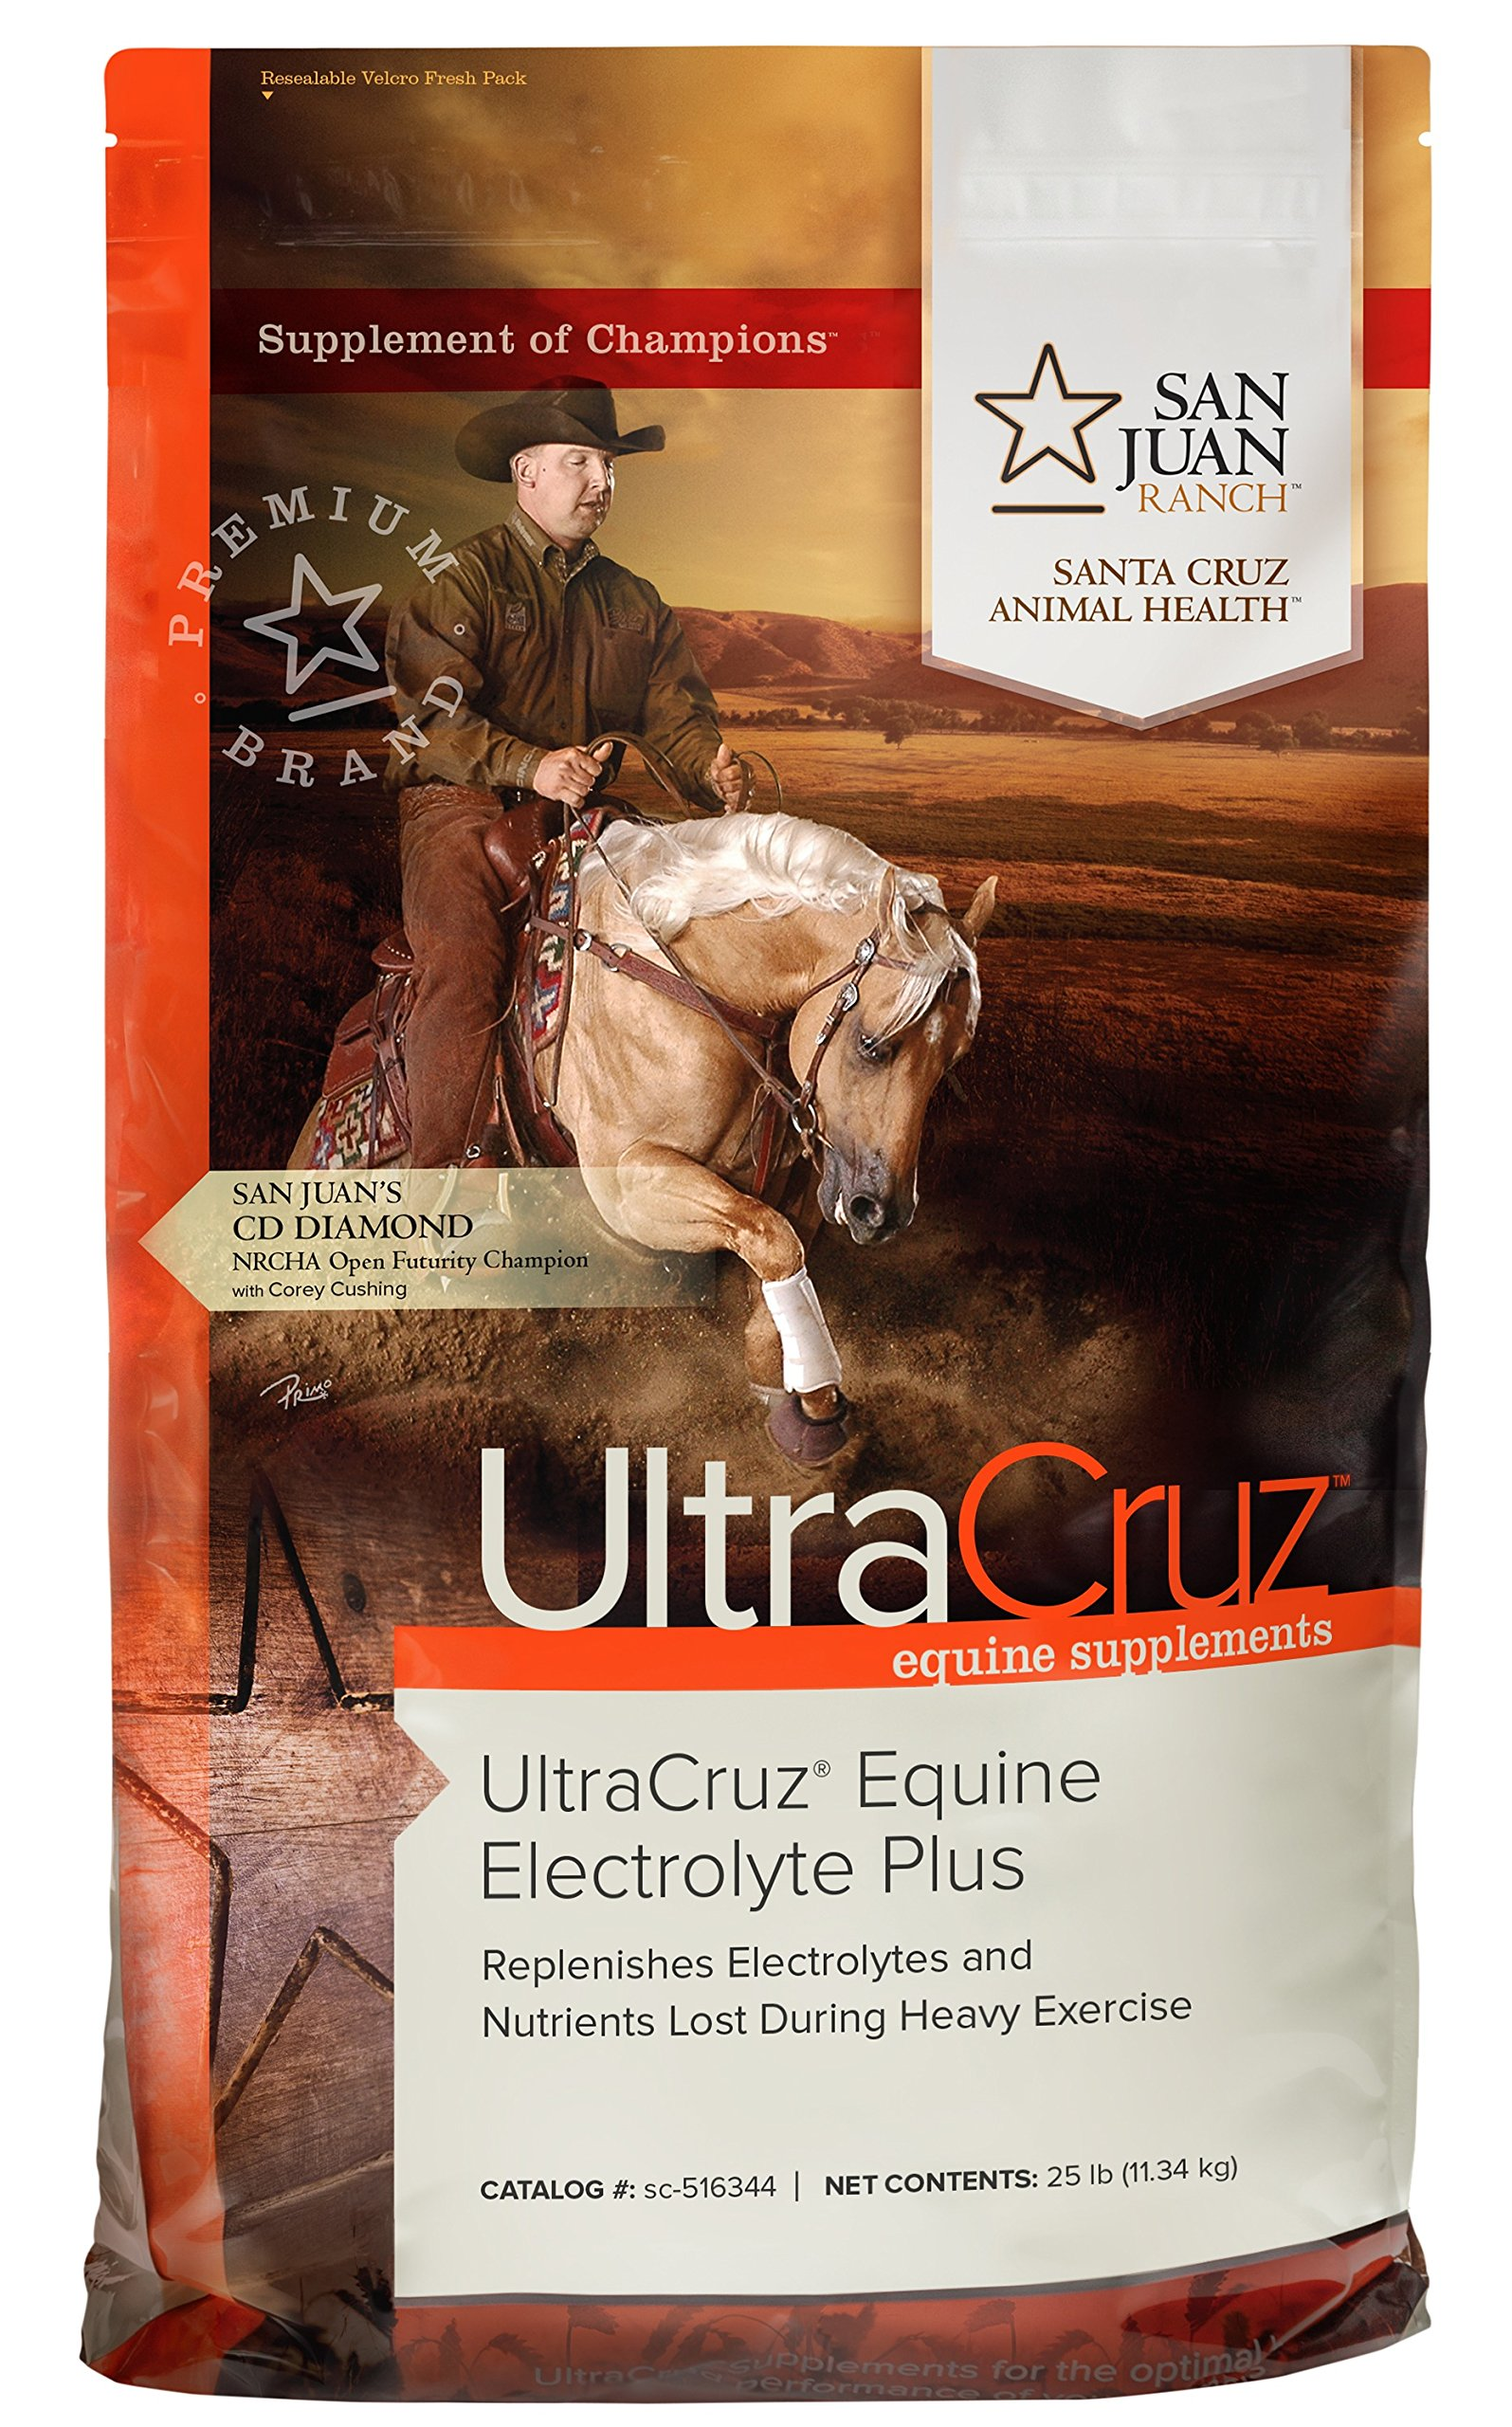 UltraCruz Equine Electrolyte Plus Supplement for Horses, 25 lb, Pellet (93 Day Supply)